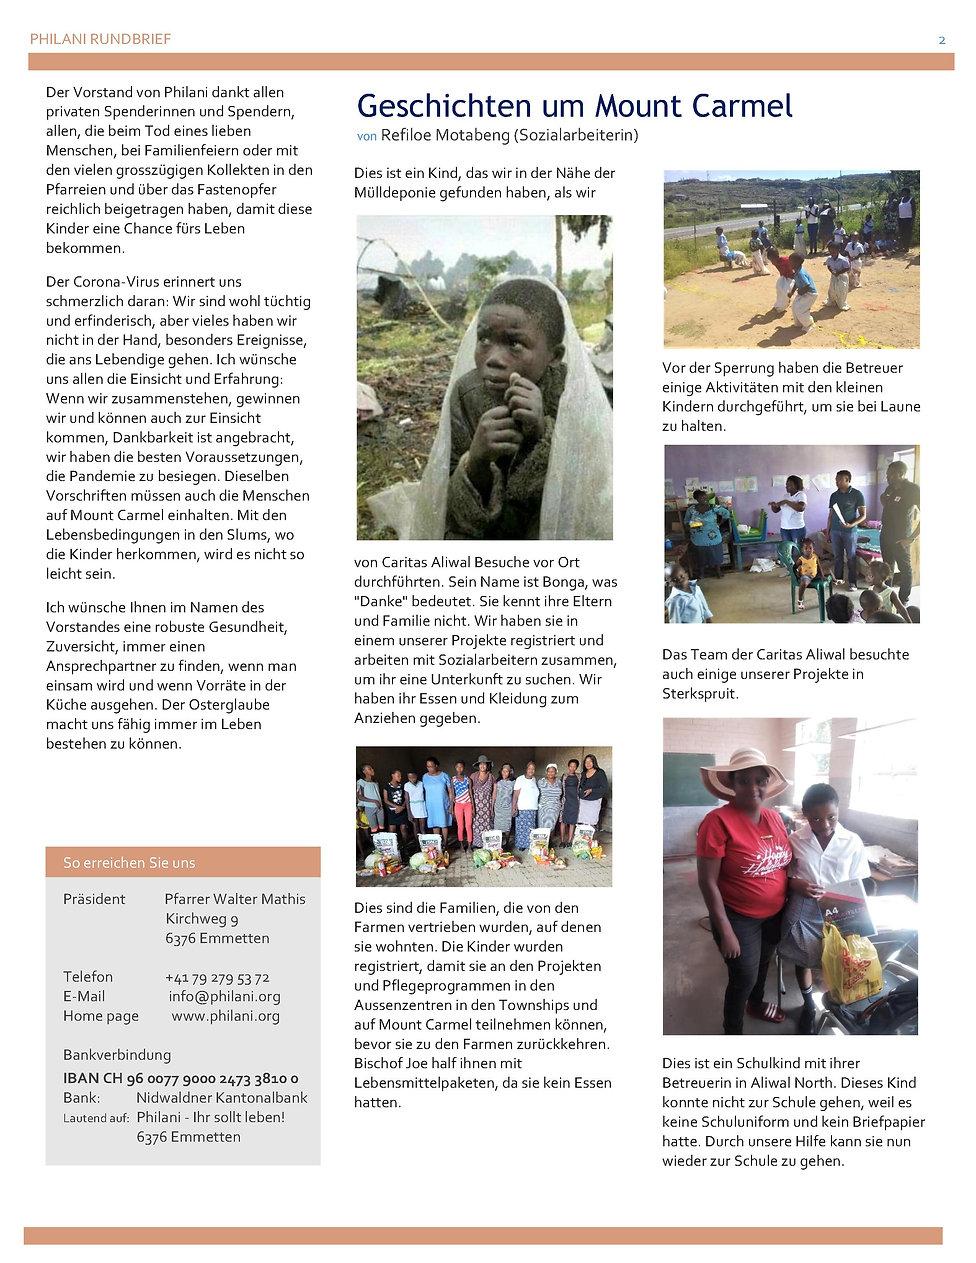 Philani Newsletter Mai 2020_2.jpg